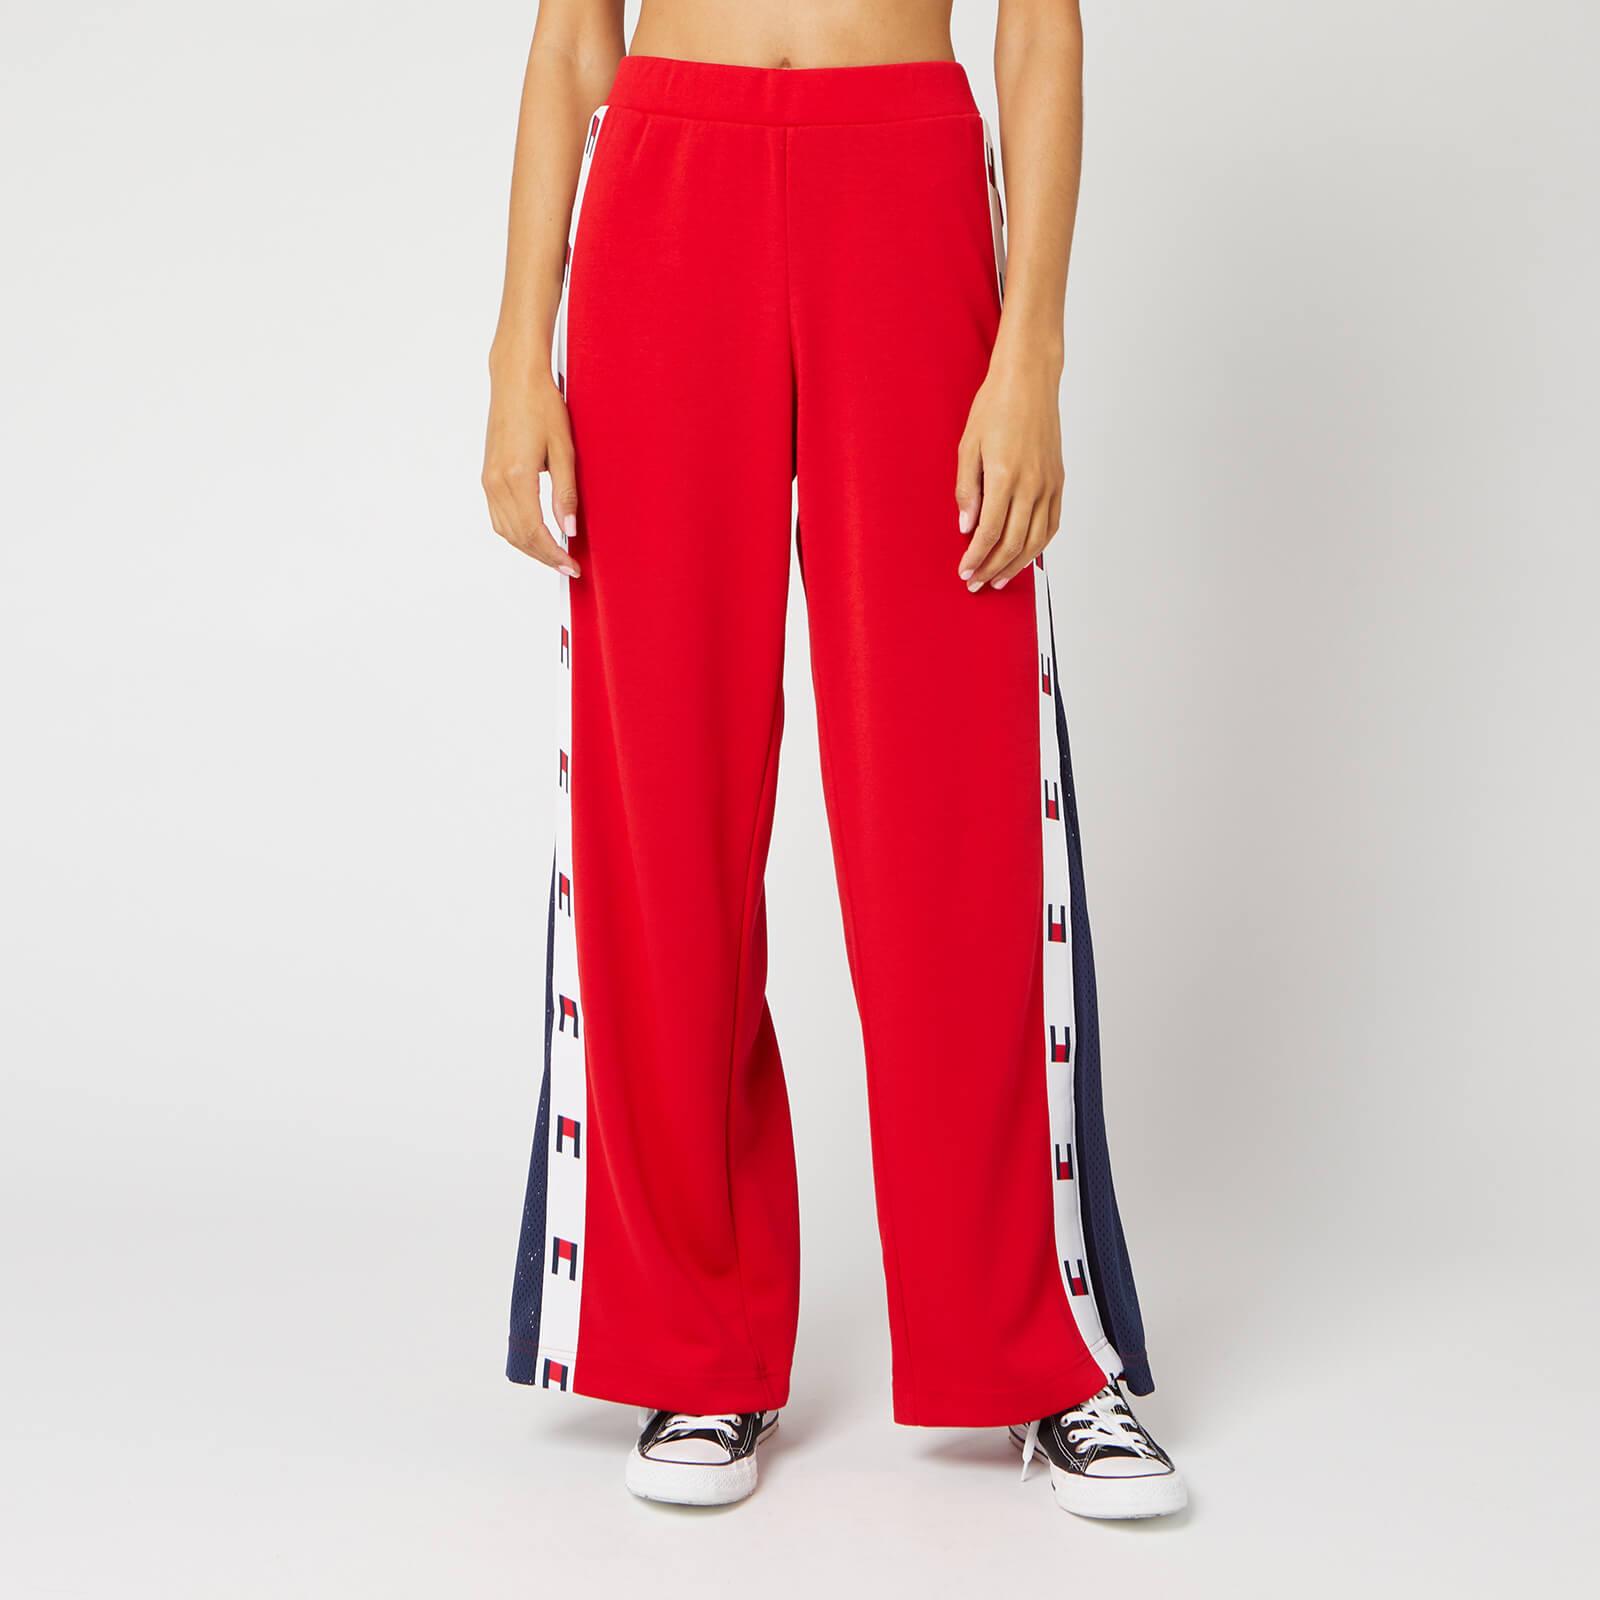 Tommy Sport Women's Flag Tape Flare Pants - True Red - L